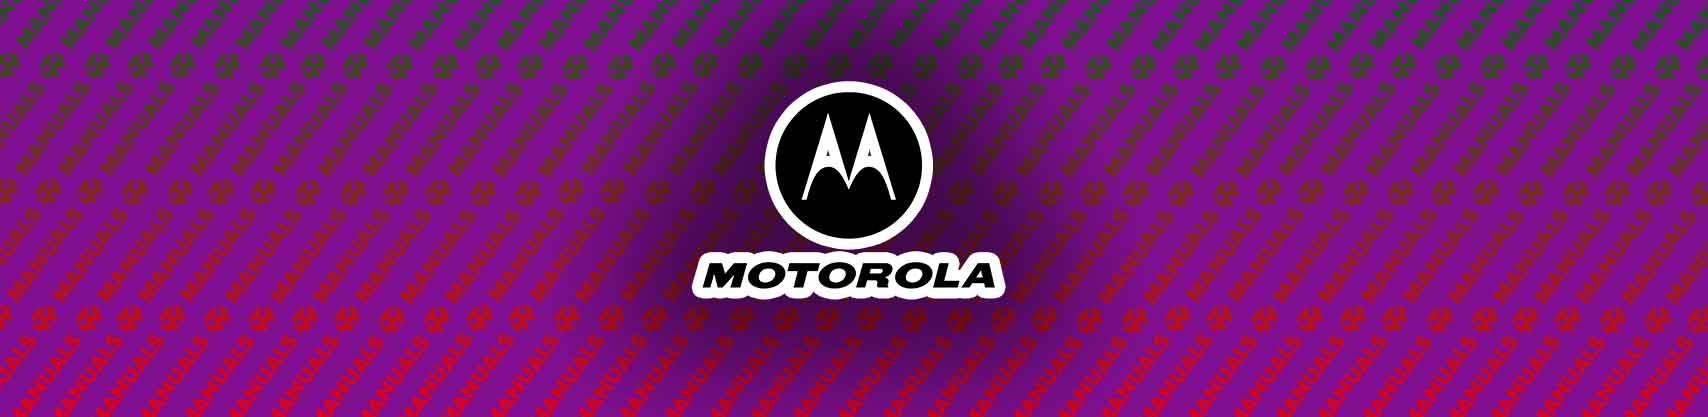 Motorola MBP36S Manual